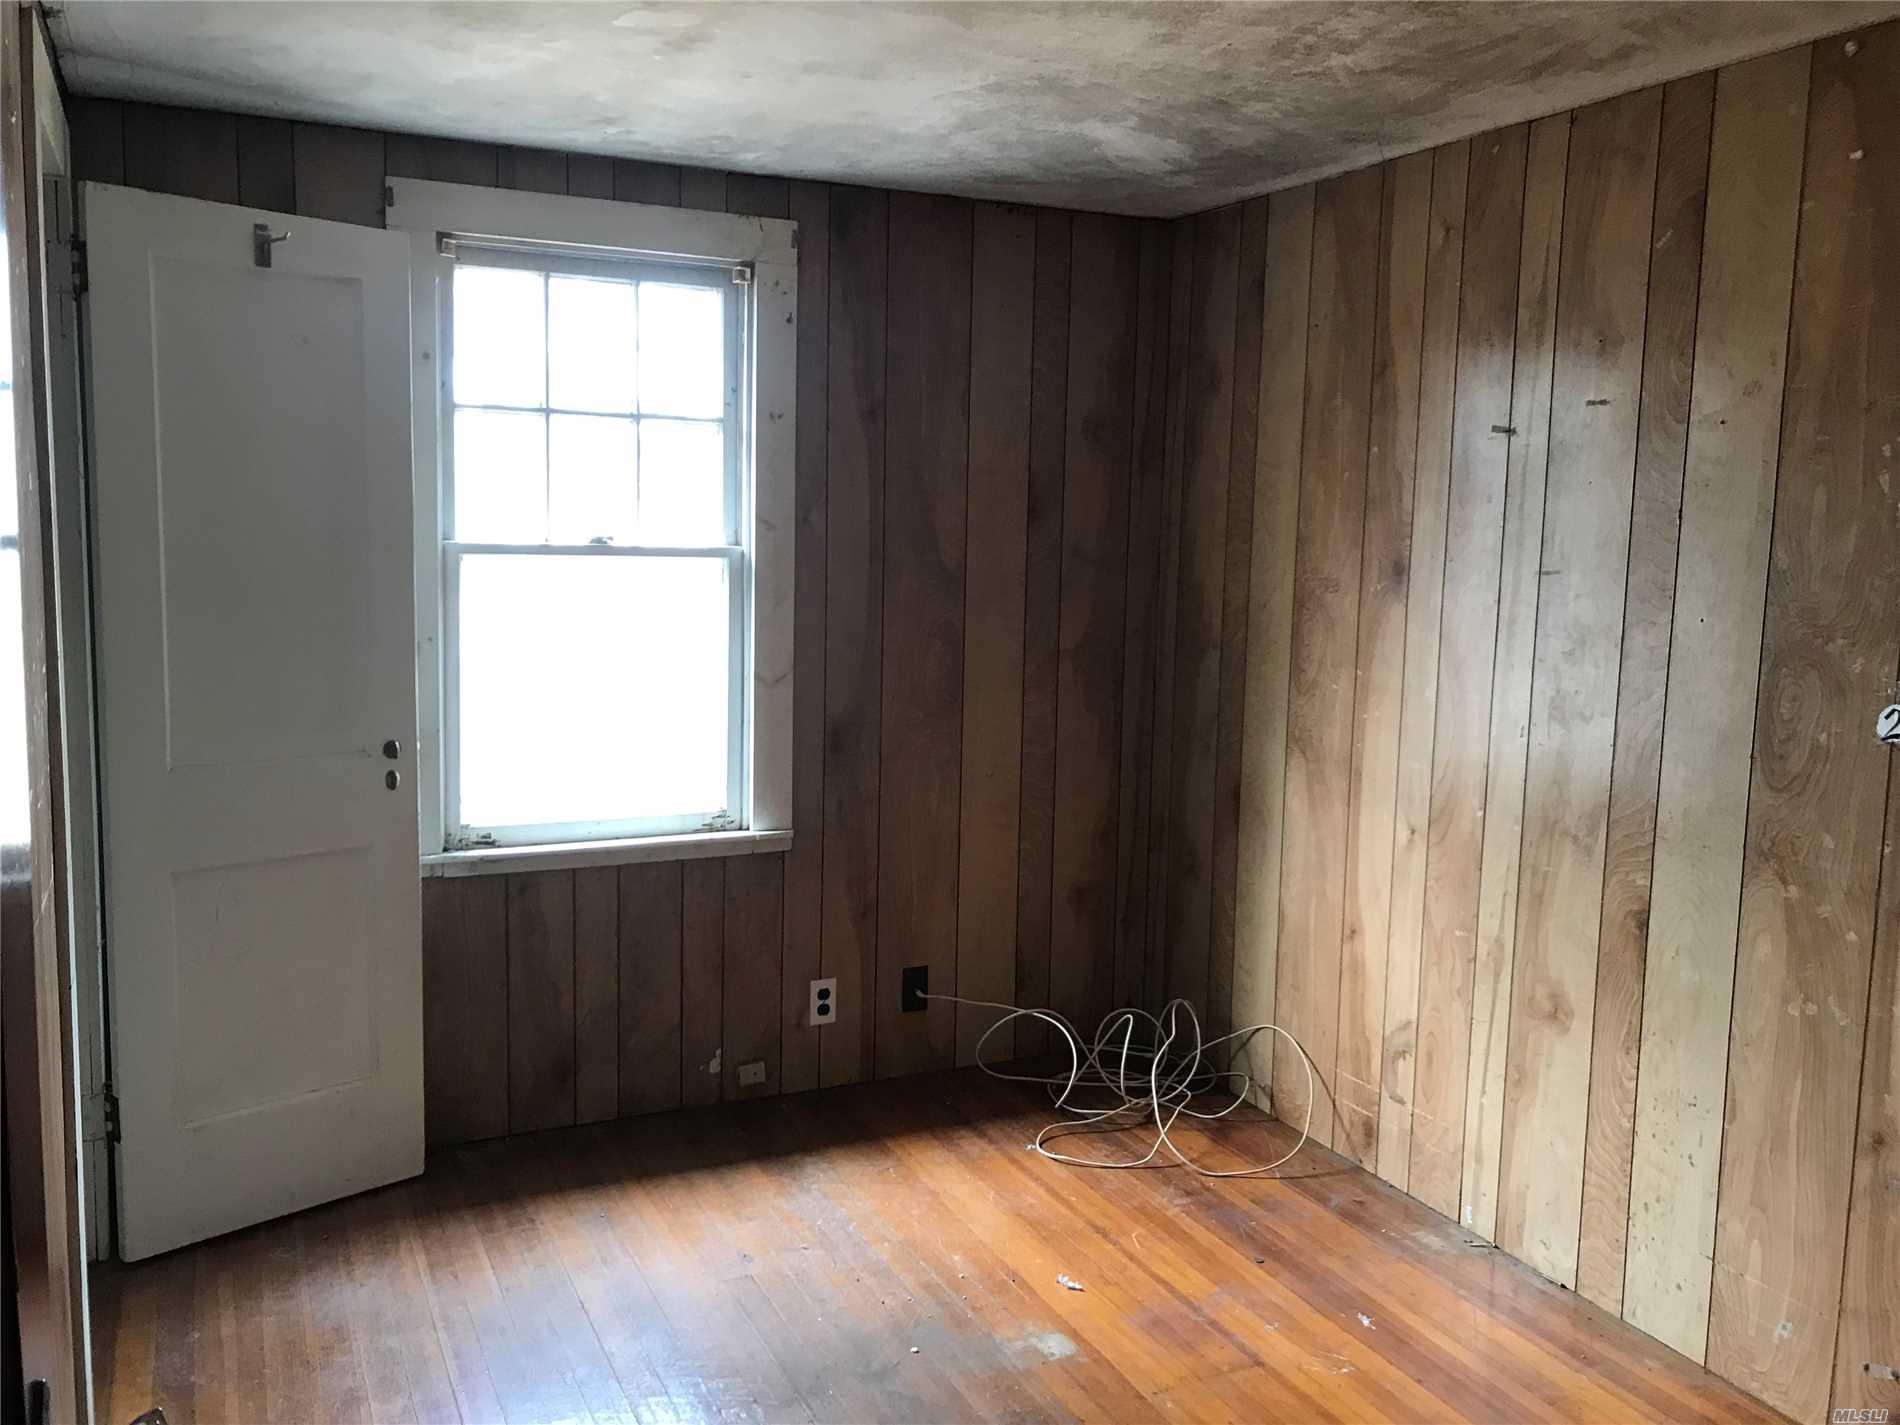 36 Pulaski St Riverhead, NY 11901